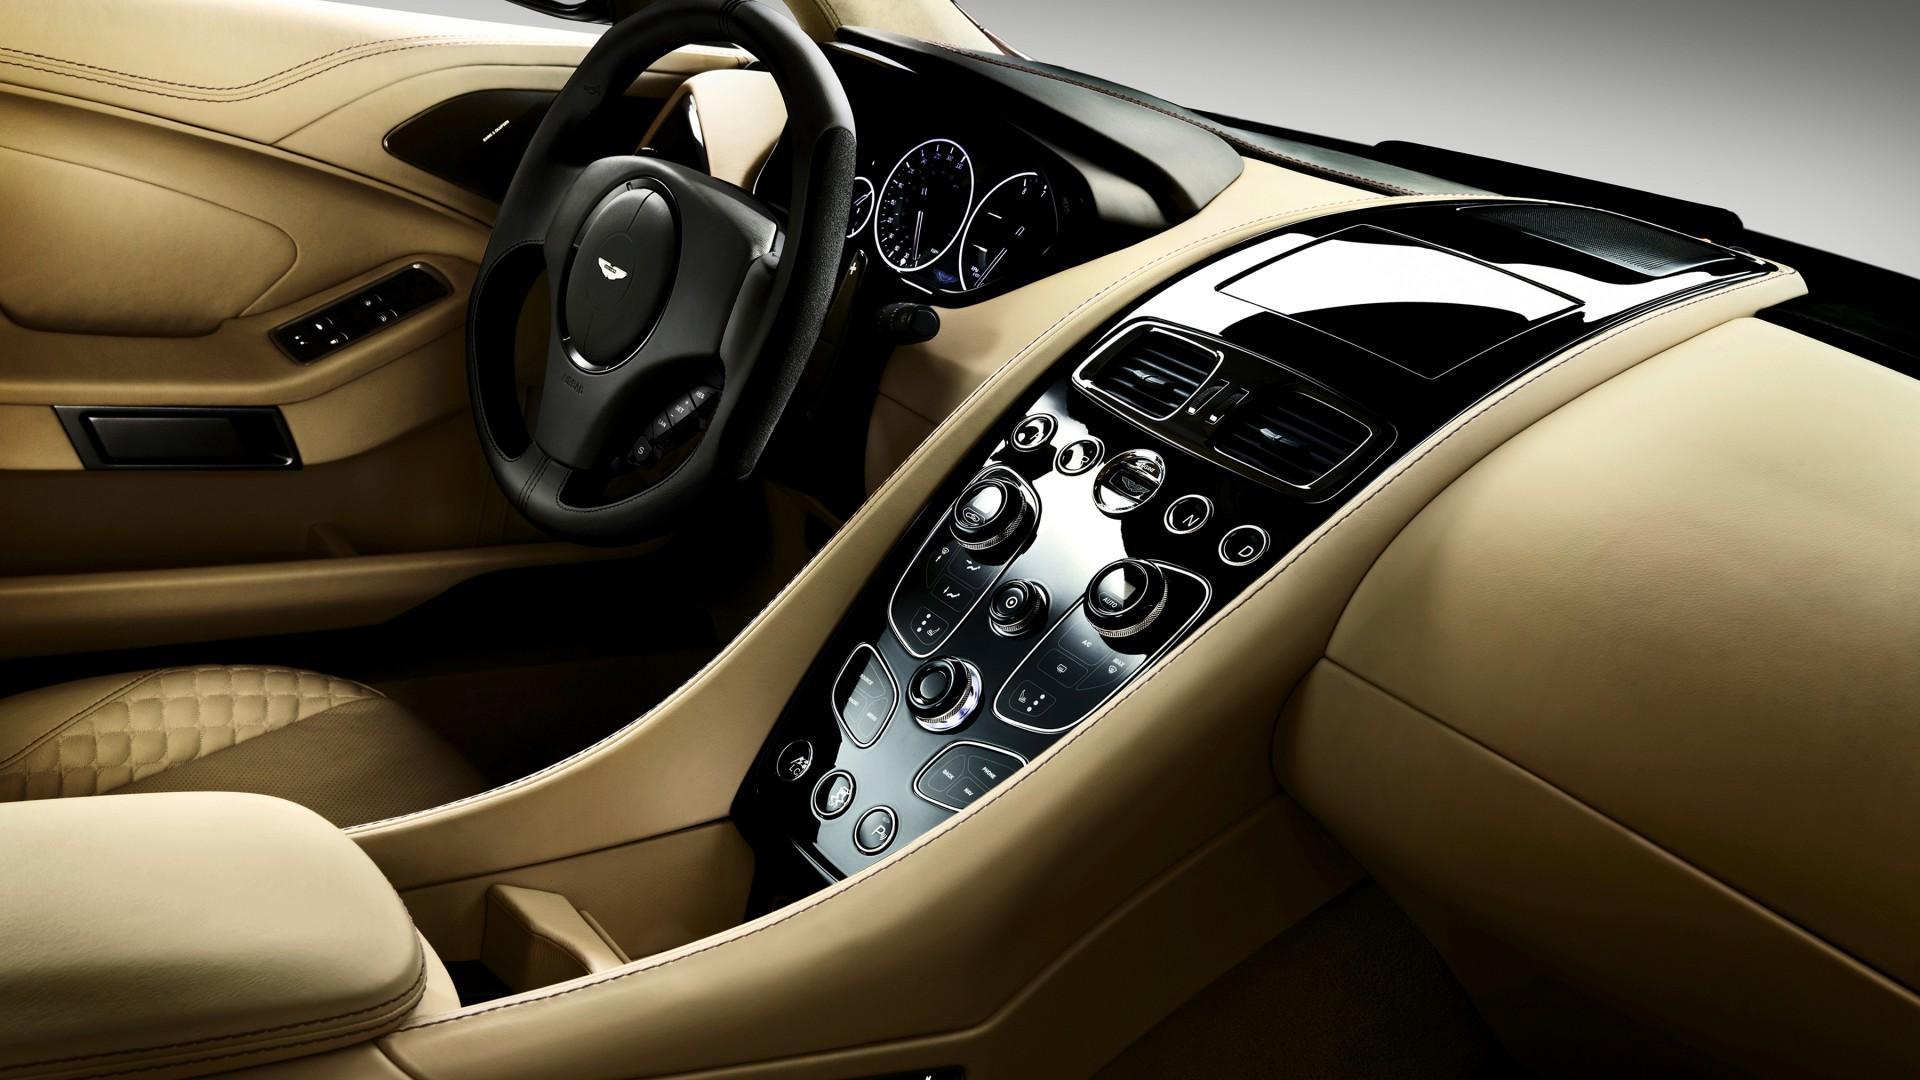 wallpaper aston martin vantage sports car v12 v8 zagato silver review test drive speed. Black Bedroom Furniture Sets. Home Design Ideas